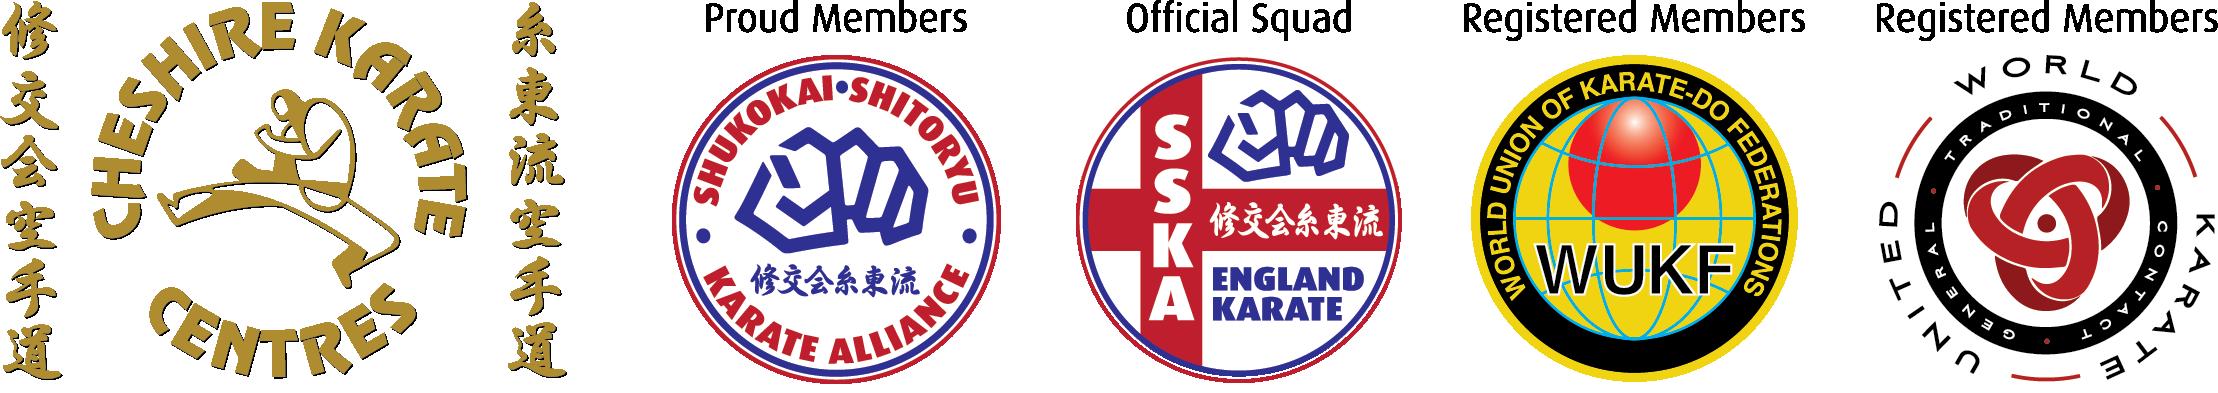 Cheshire Karate Centres Warrington